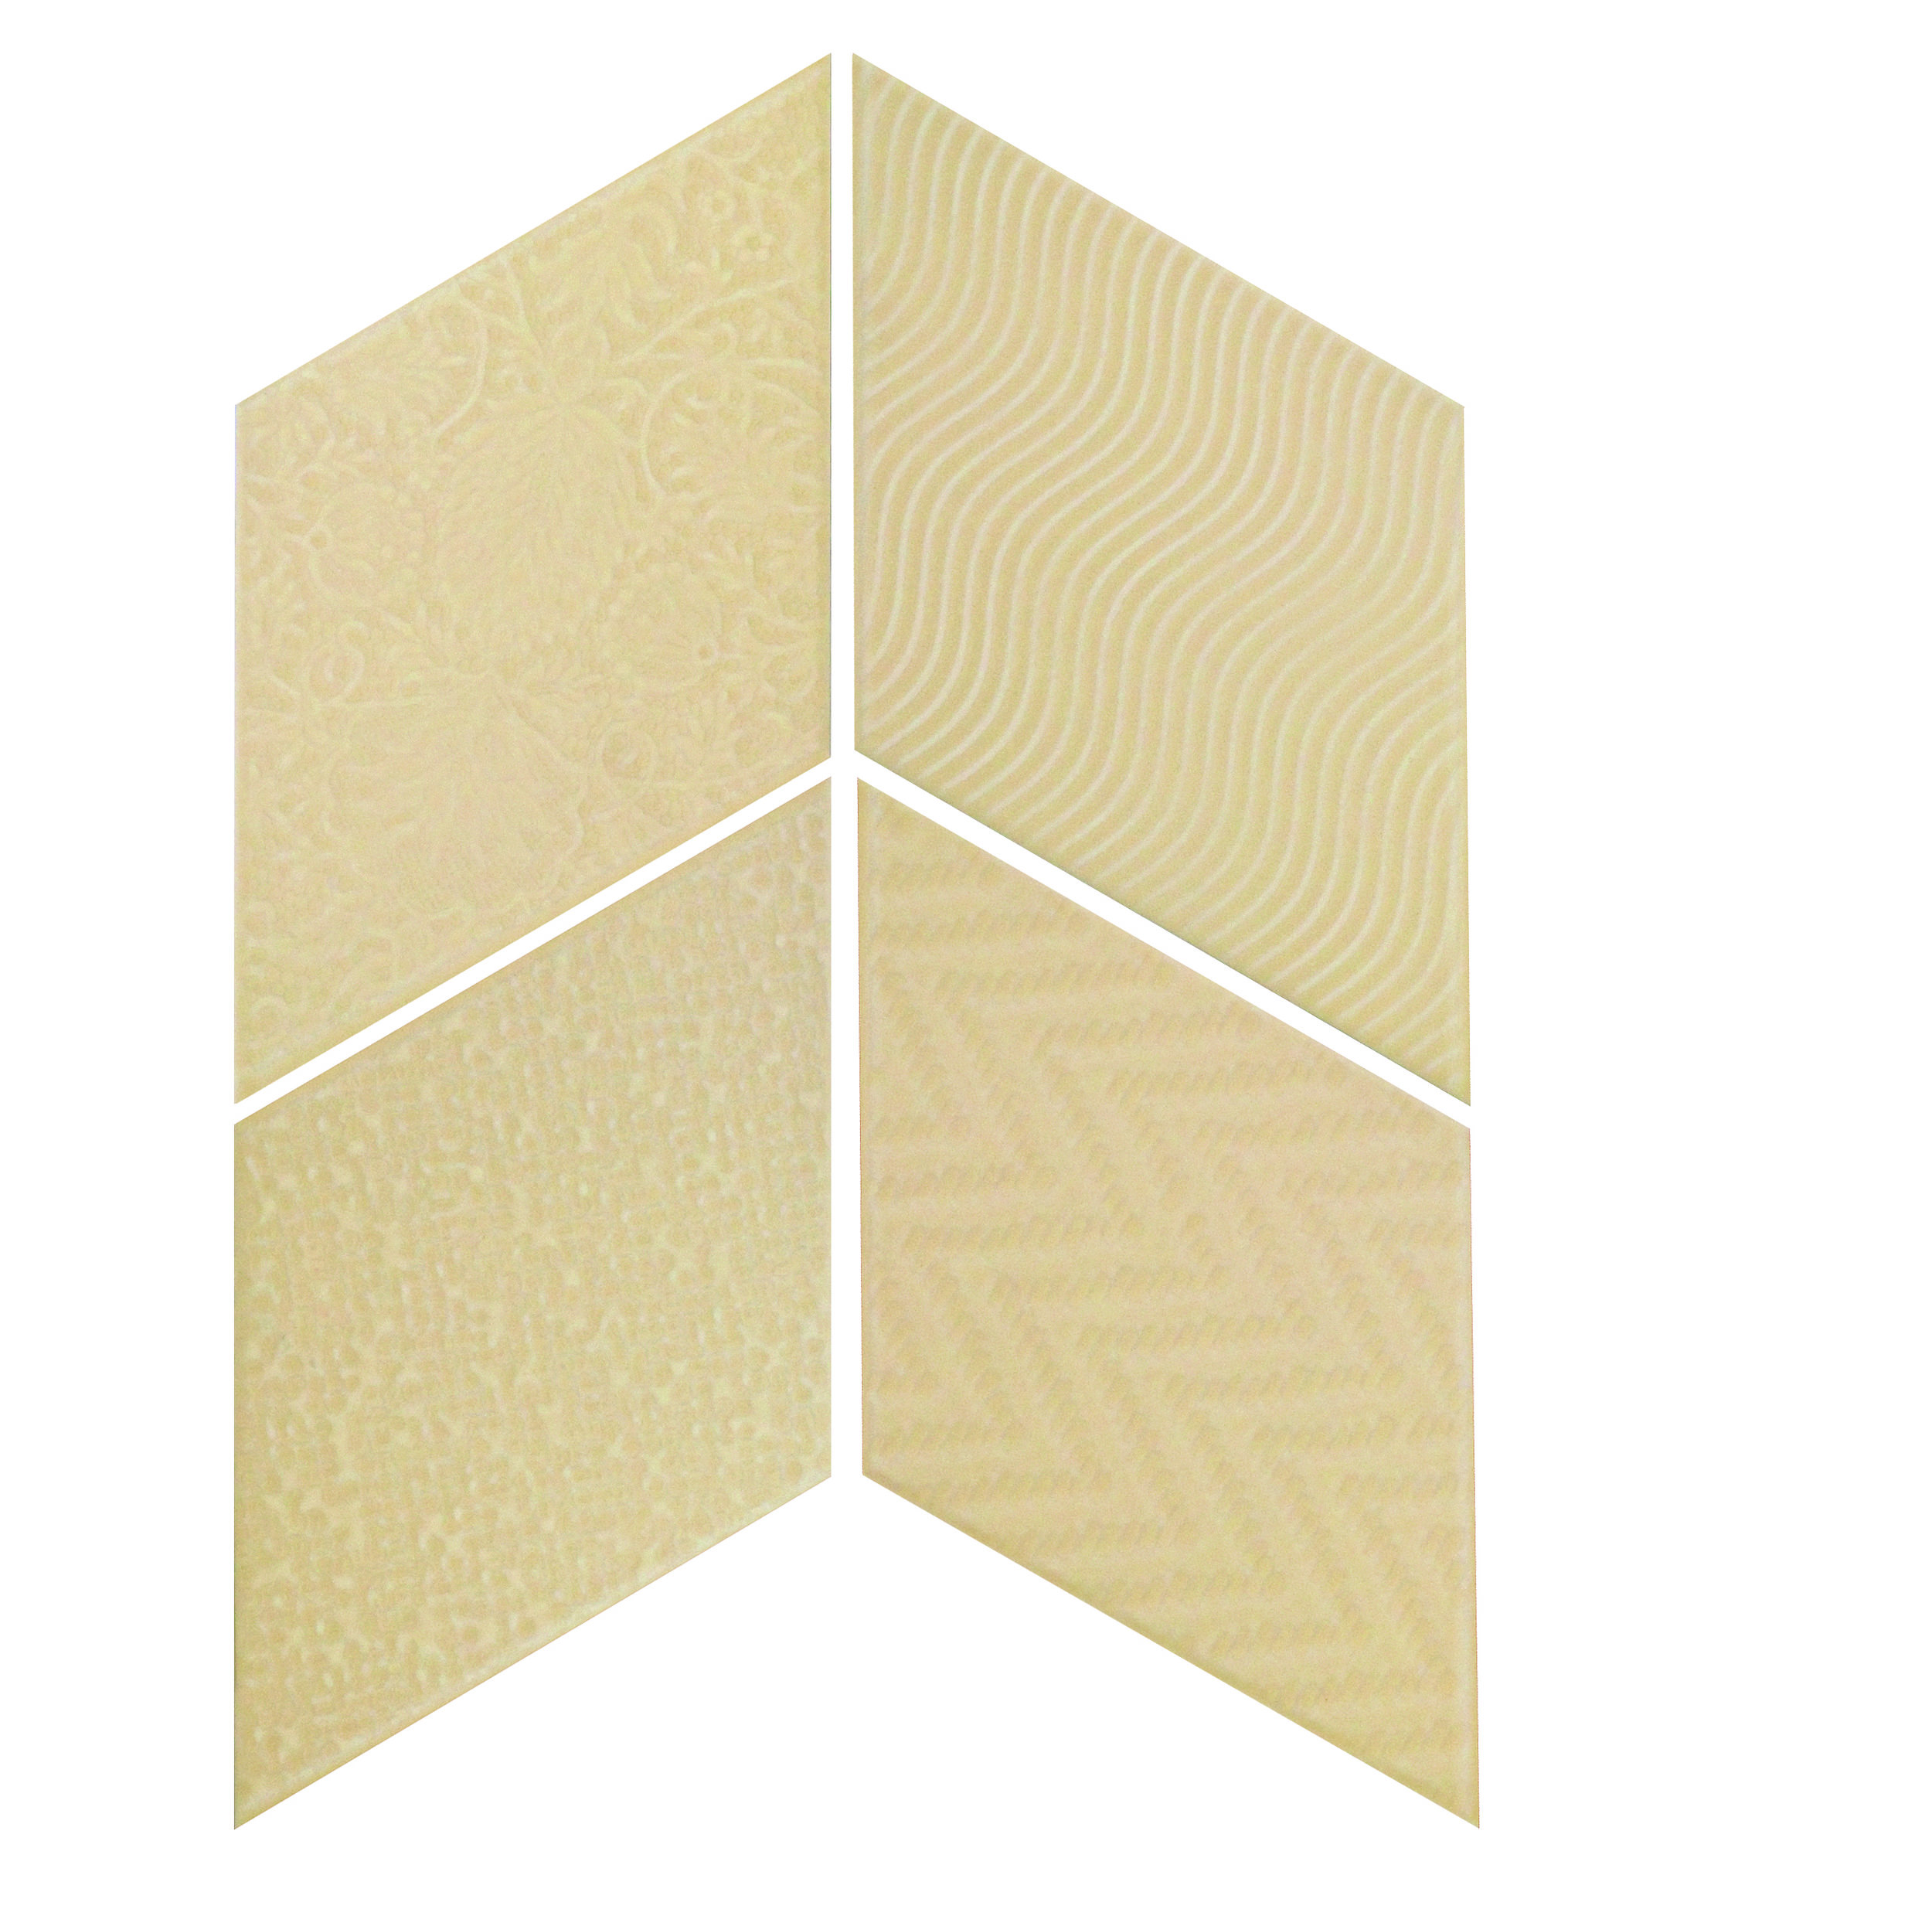 Rhombus Cream 14x24 cm  Floor & Wall Tile / Porcelain / R9